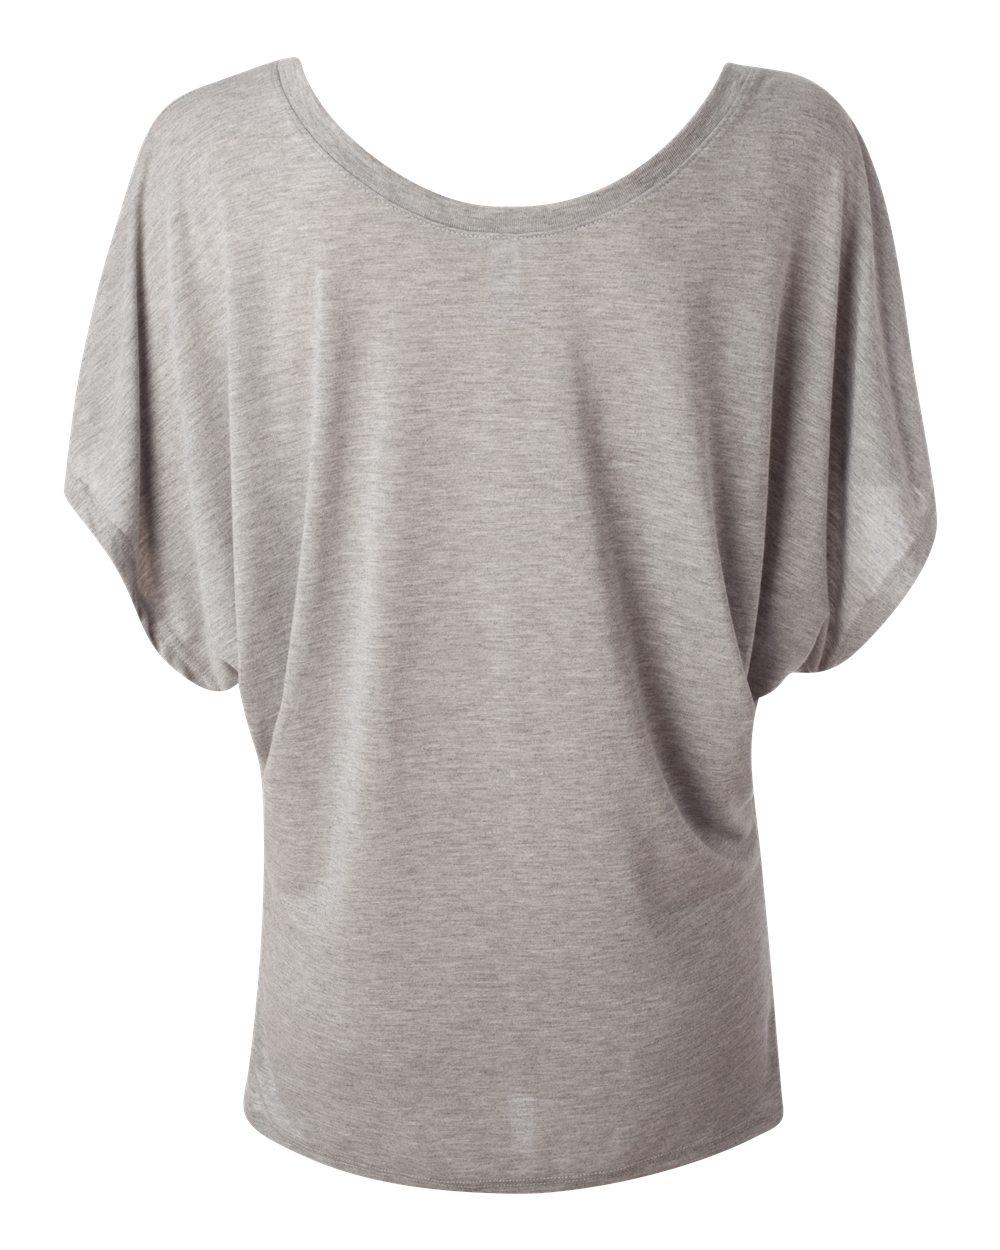 Bella-Canvas-Women-039-s-Flowy-Draped-Sleeve-Dolman-T-Shirt-8821-S-2XL thumbnail 16